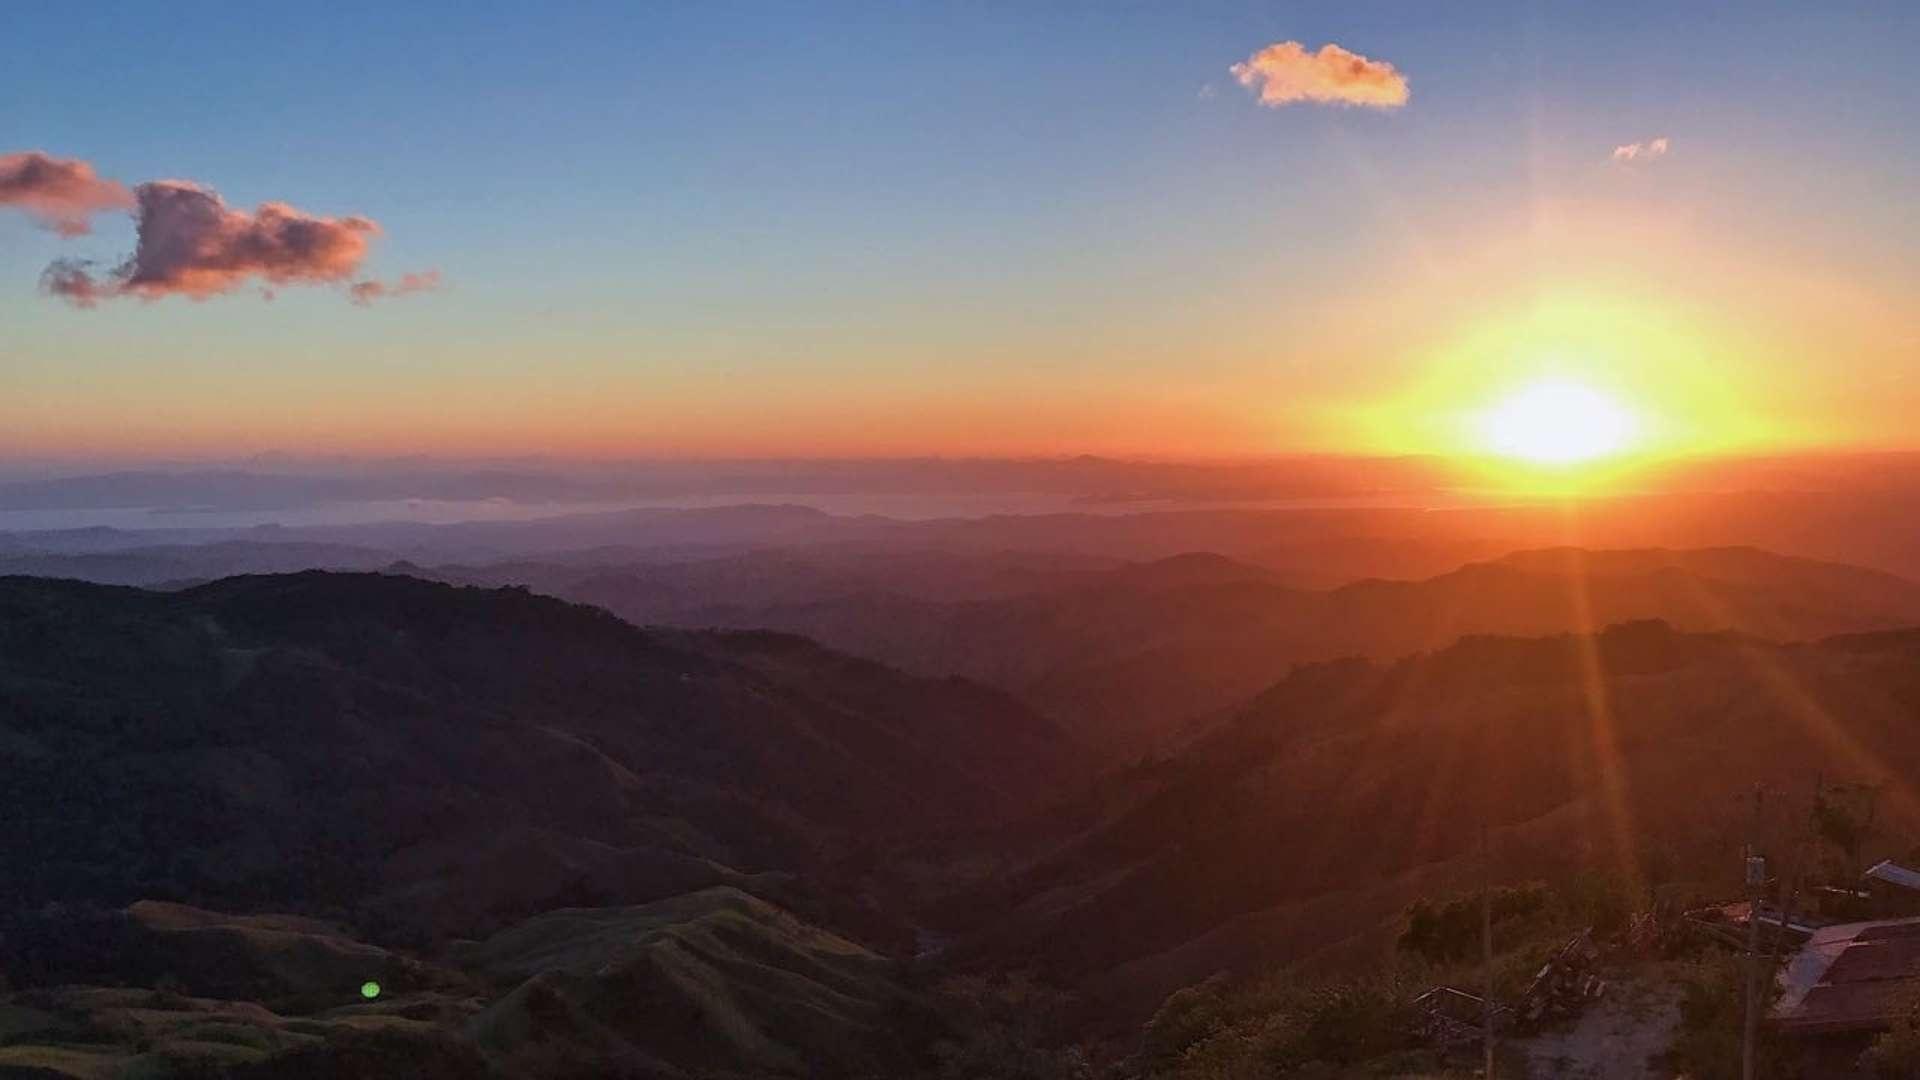 Stunning sunset views in Monteverde, Costa Rica